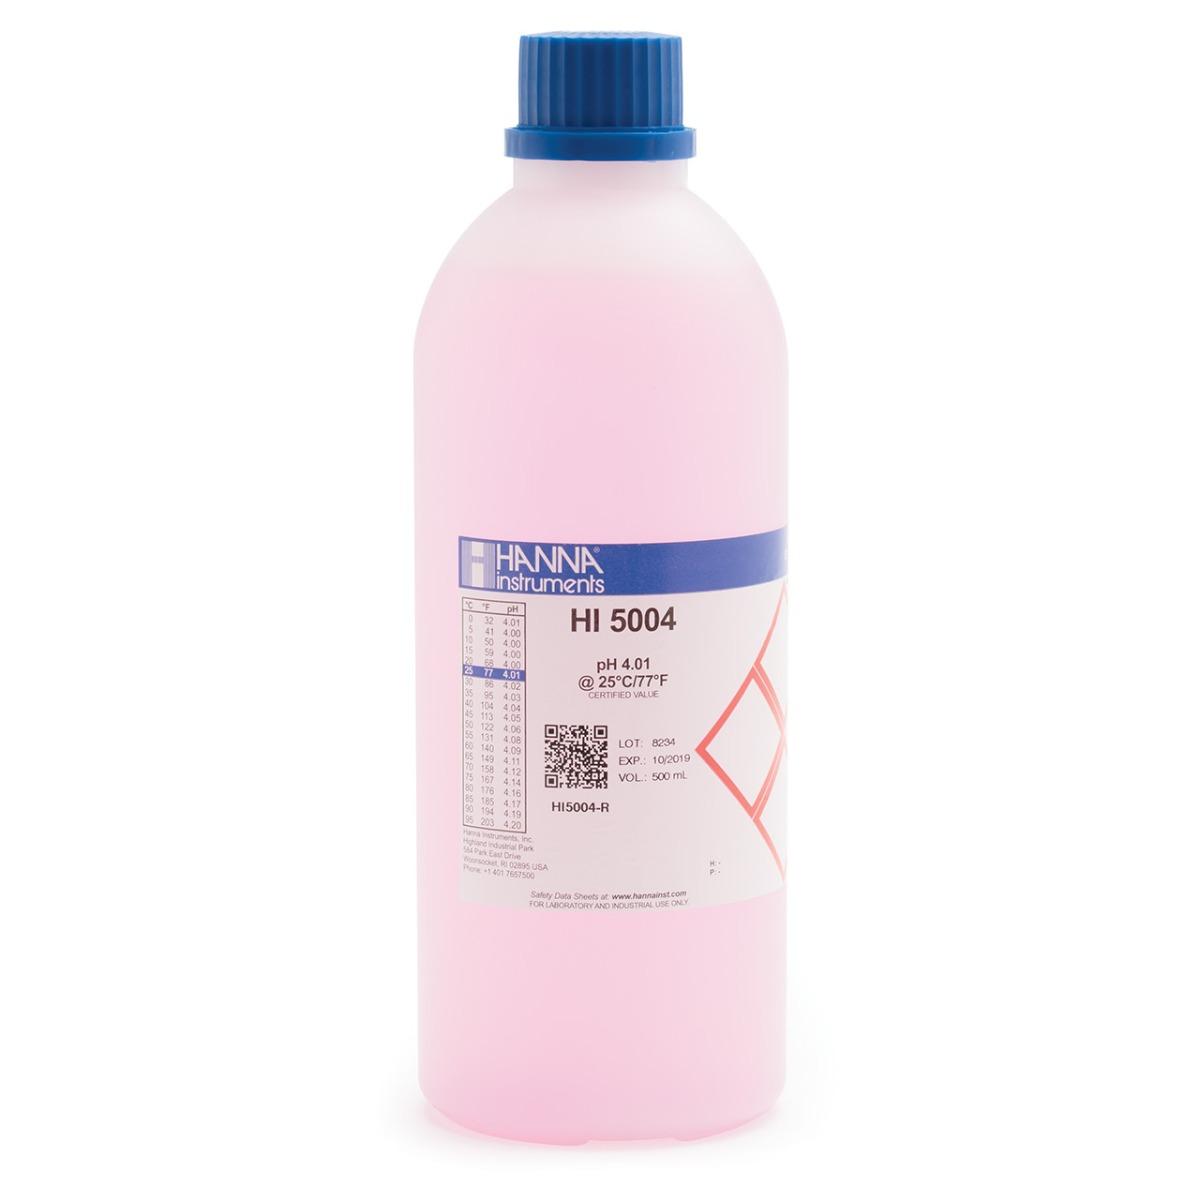 HI5004-R pH 4.01 Technical Calibration Buffer (500 mL)